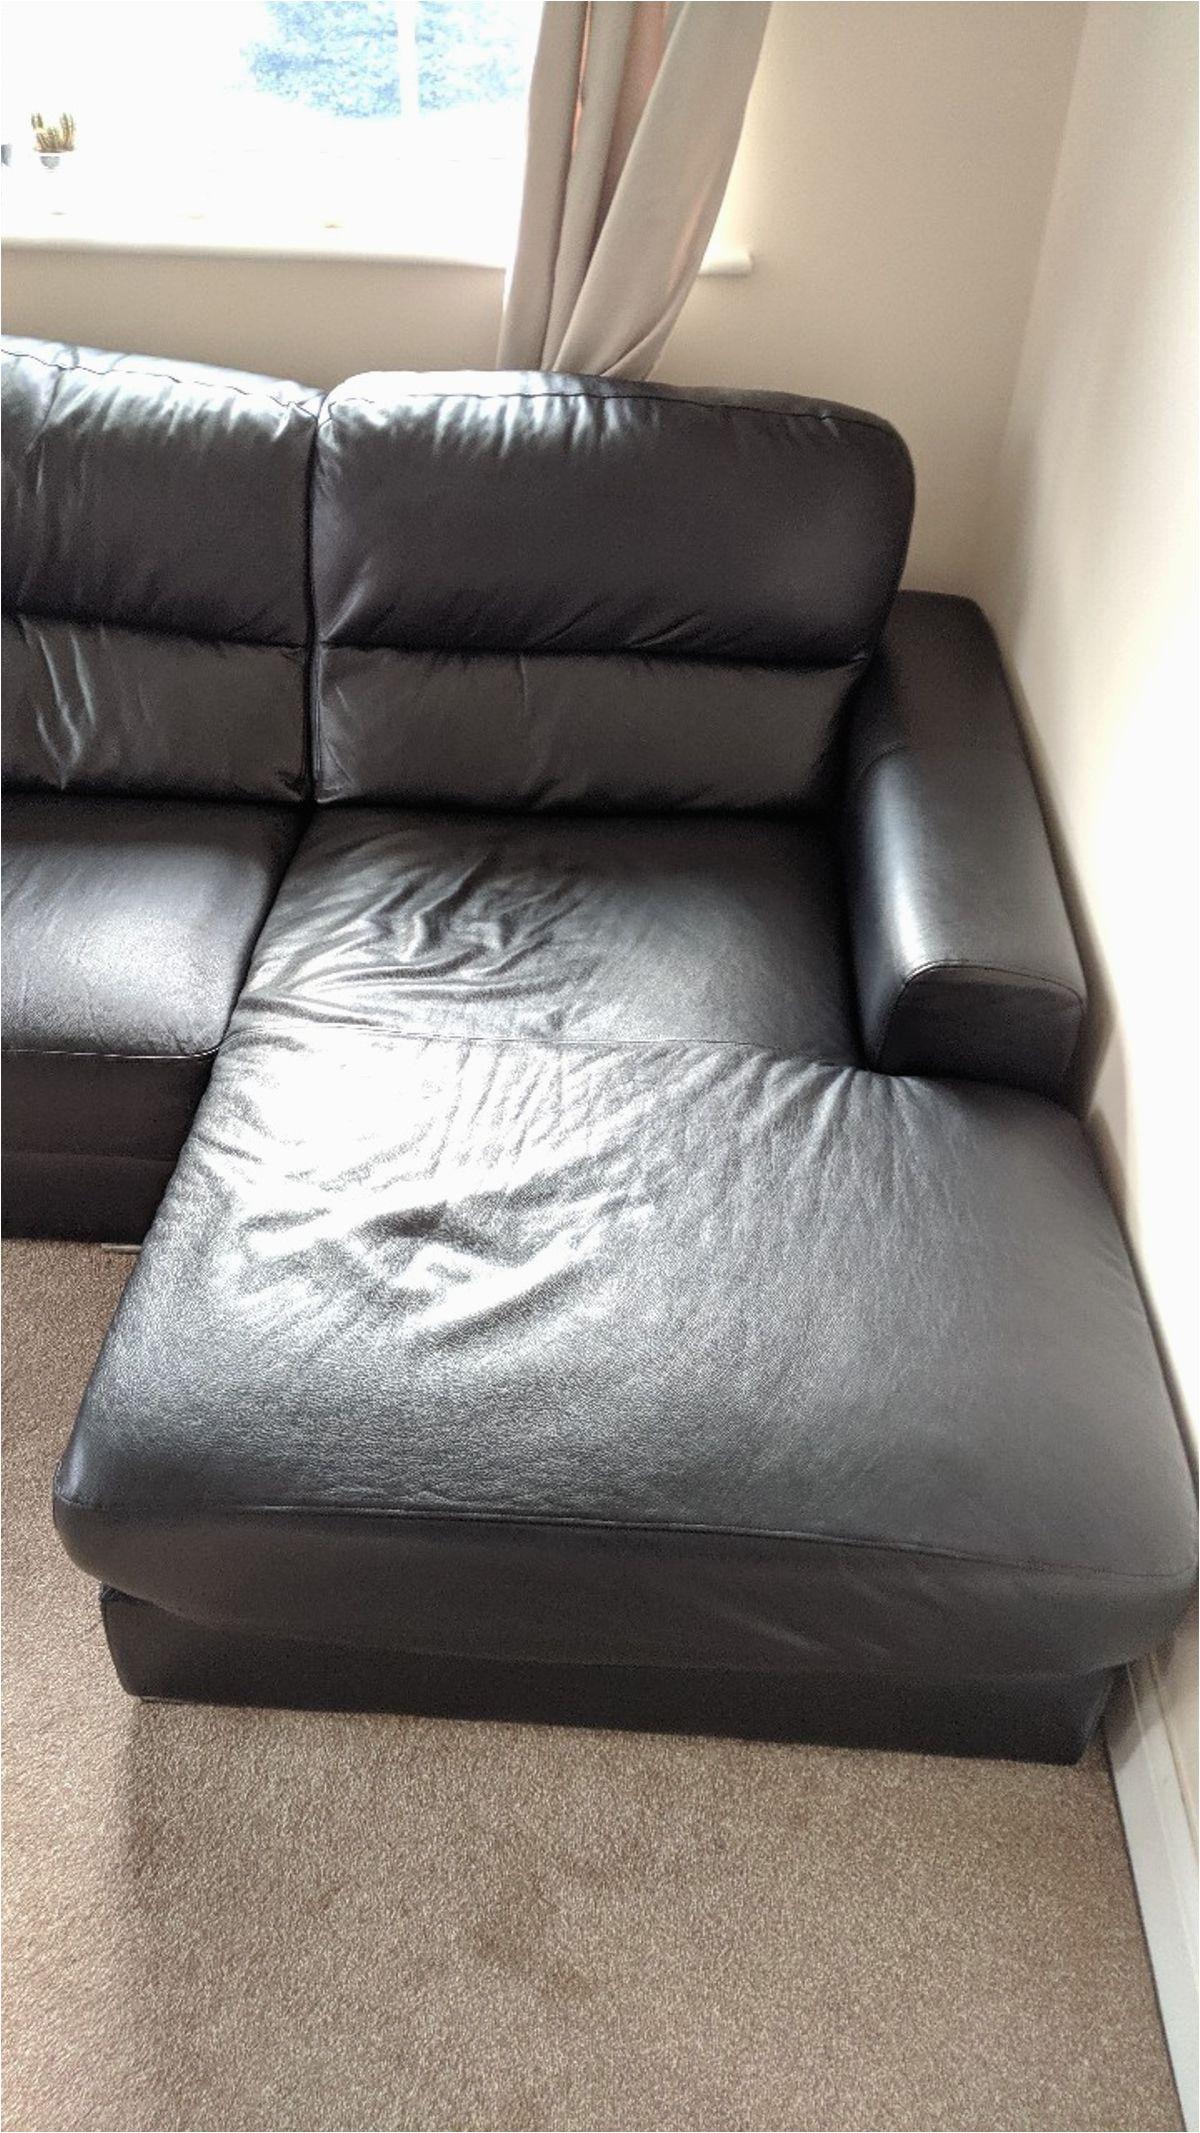 Second Hand Black Leather Sofa In 2020 Black Leather Sofas Leather Sofa Sofa